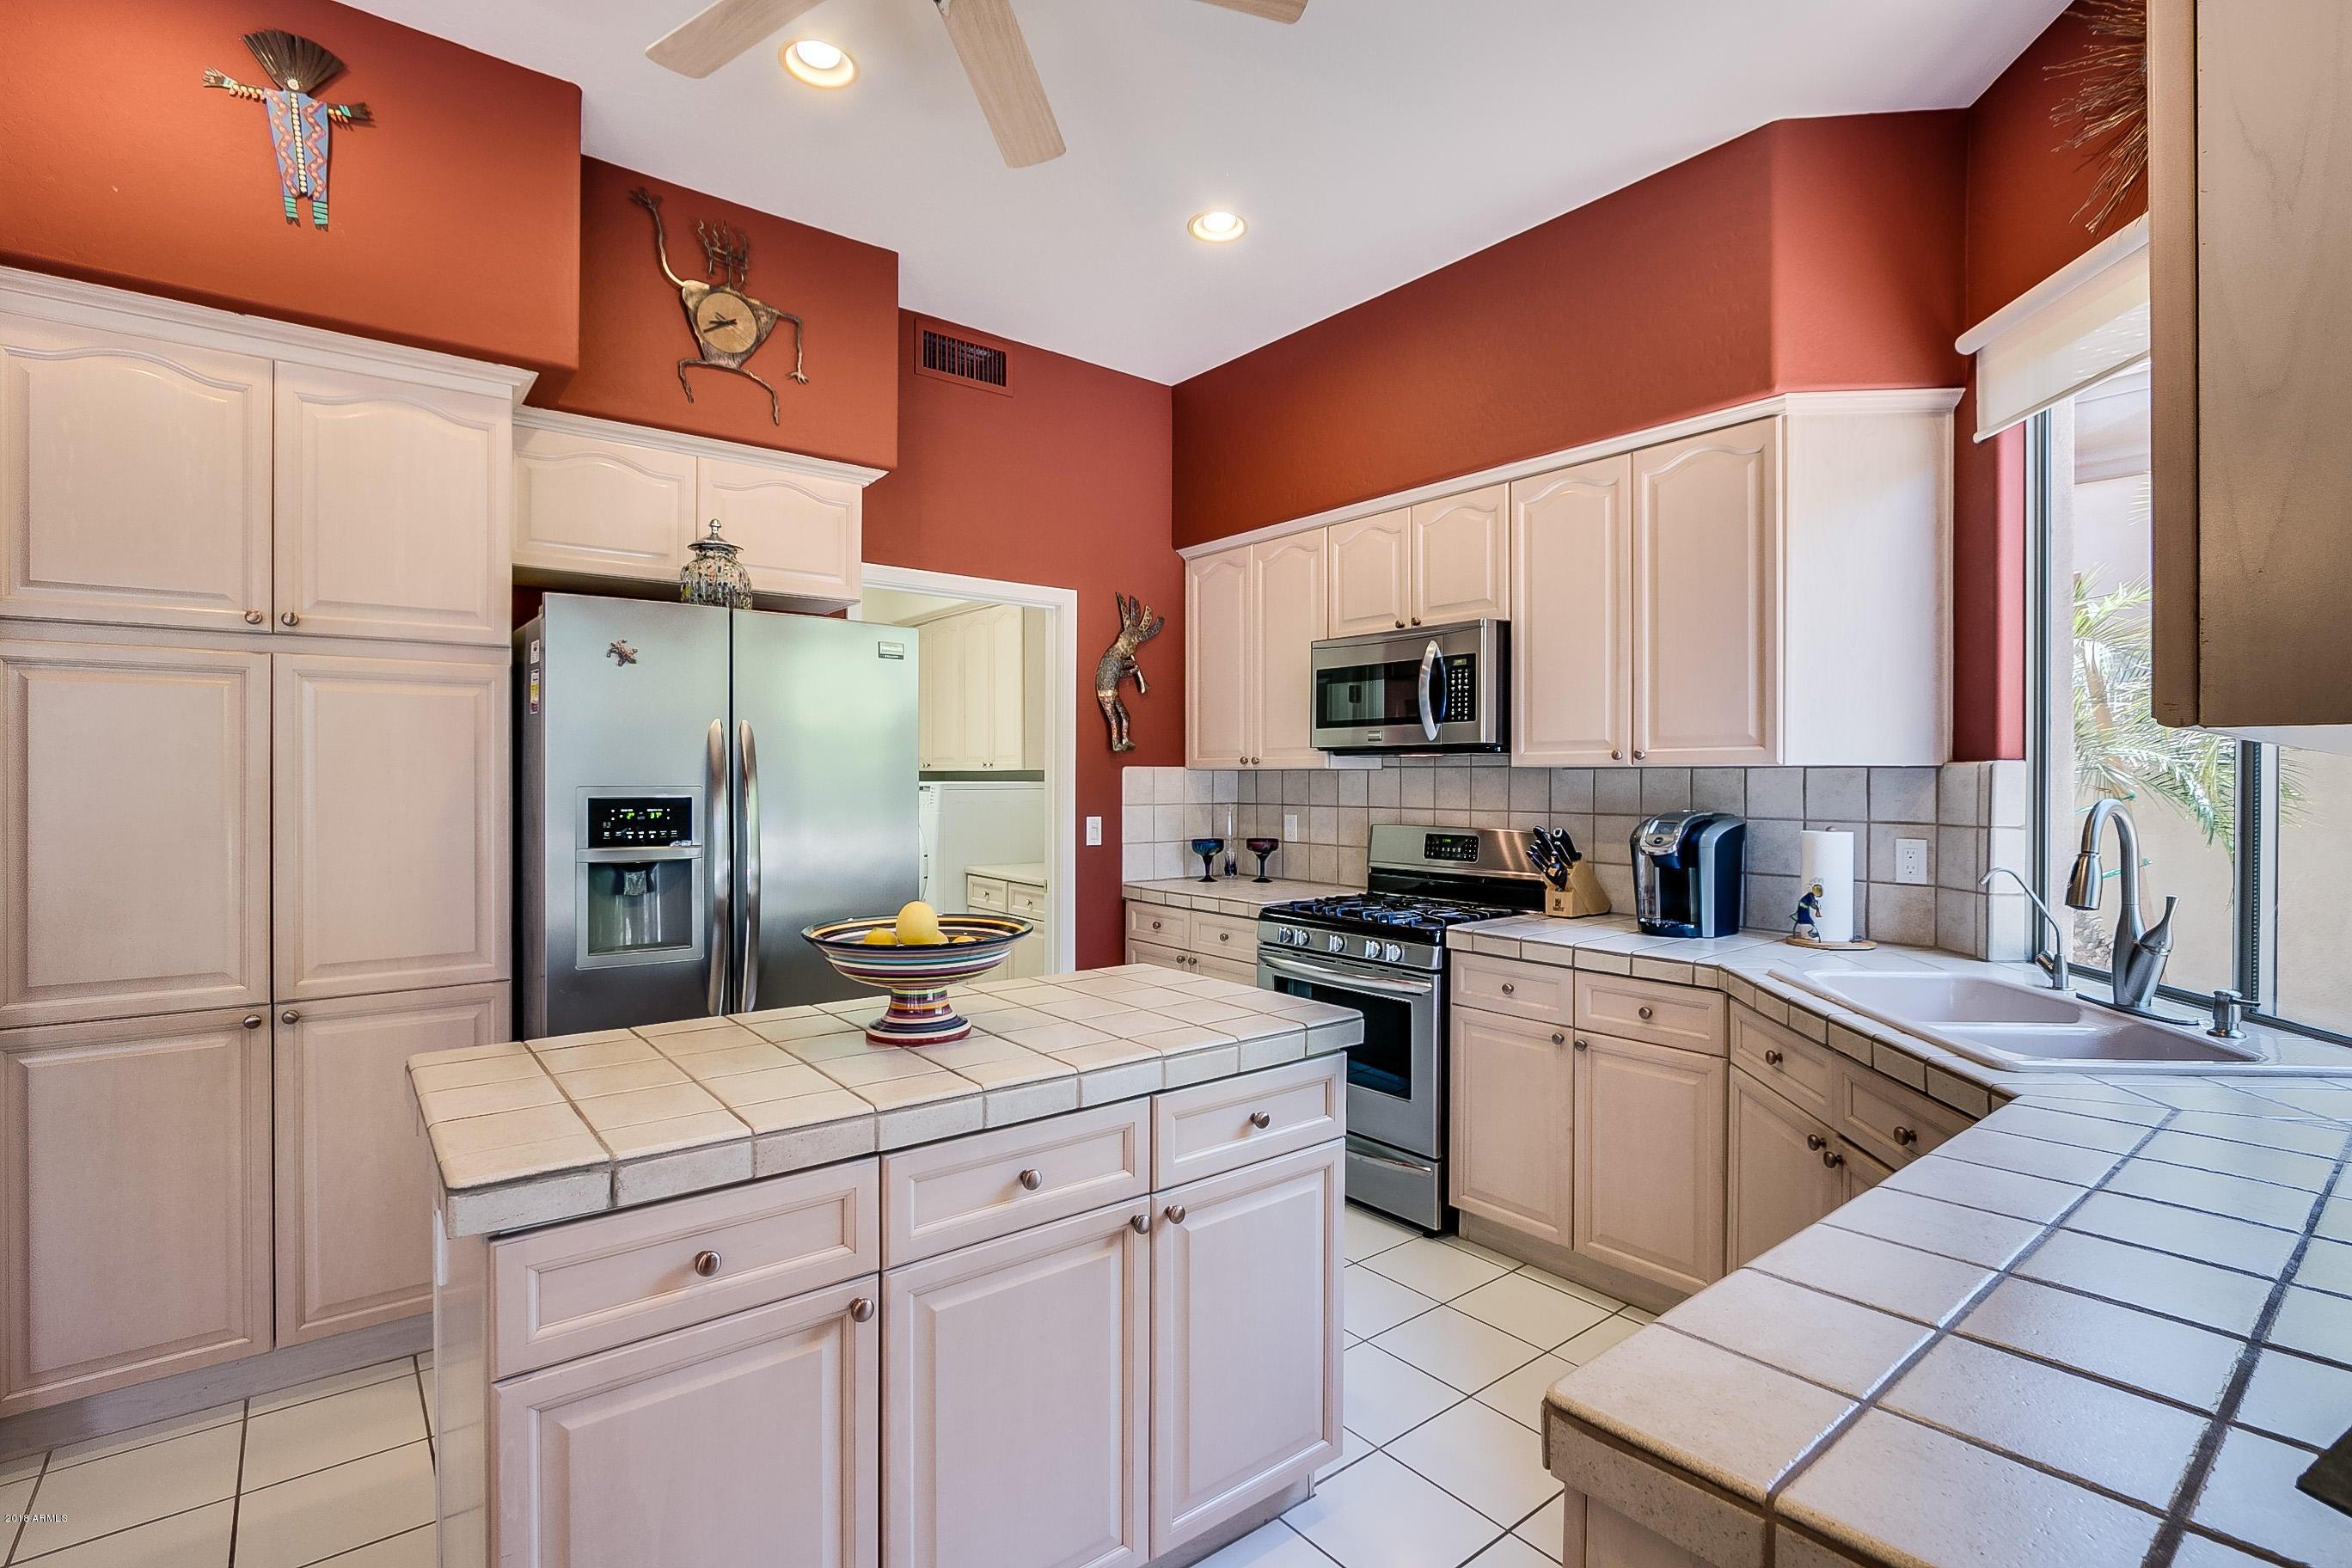 32476 N 71st Way Scottsdale, AZ 85266 - MLS #: 5764799